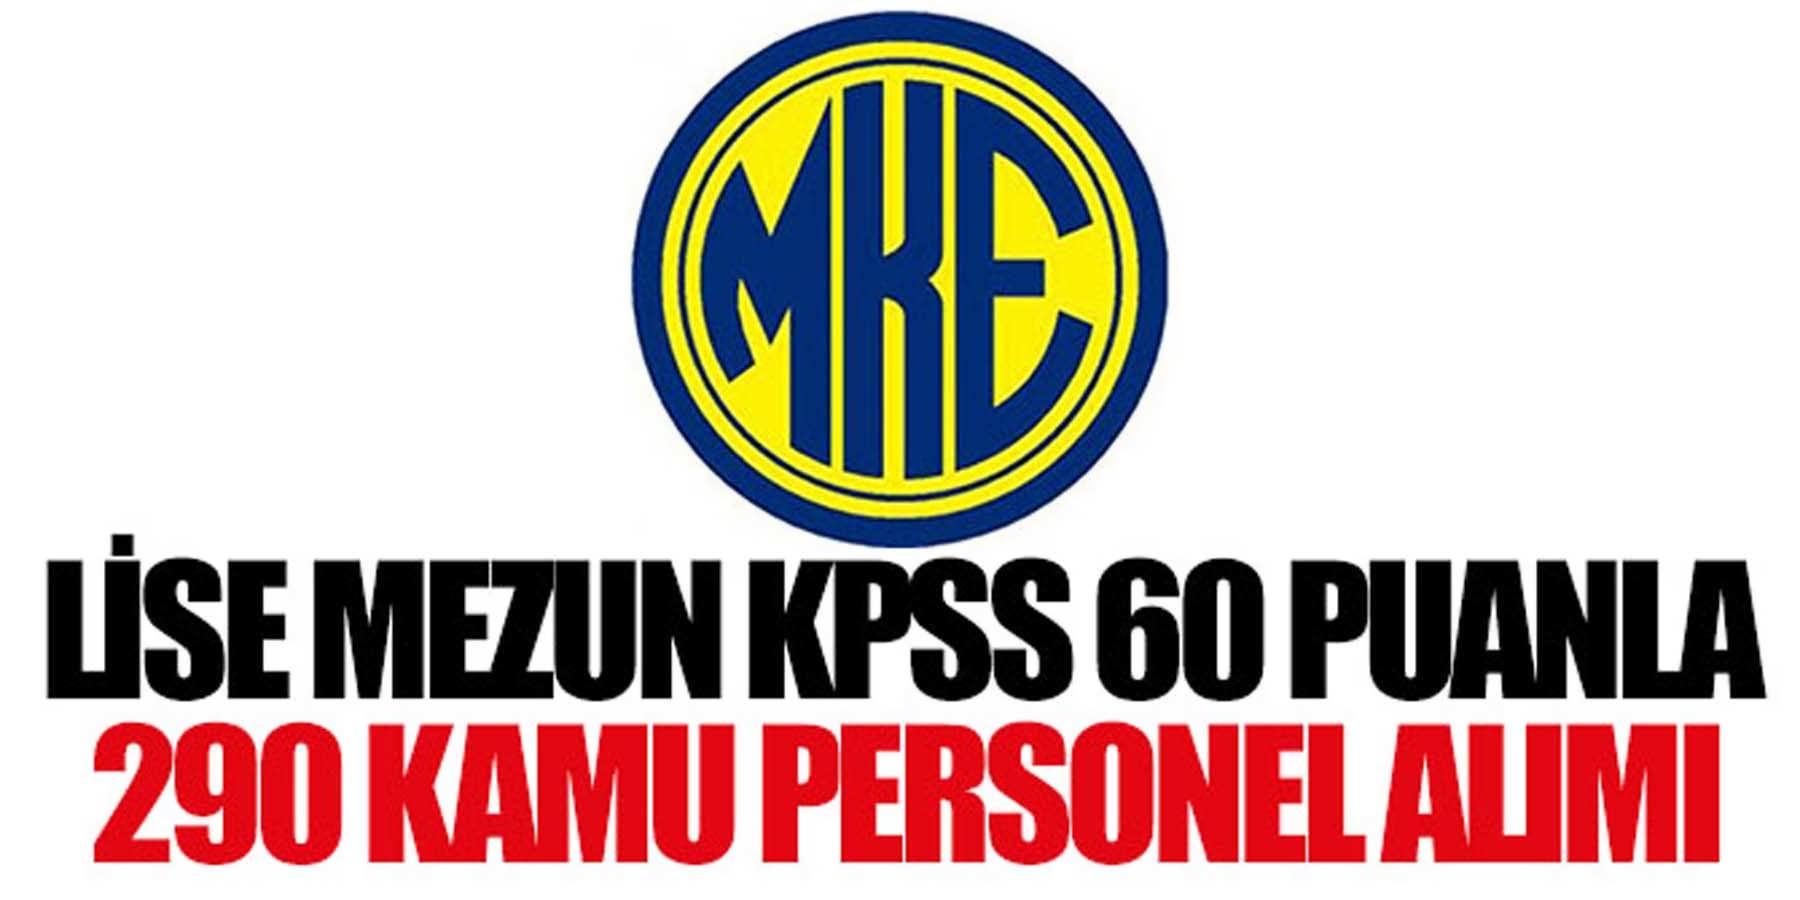 MKEK KPSS' 60 Puanla Lise Mezun 290 Kamu Personeli Alımı (Kamu Grubu)